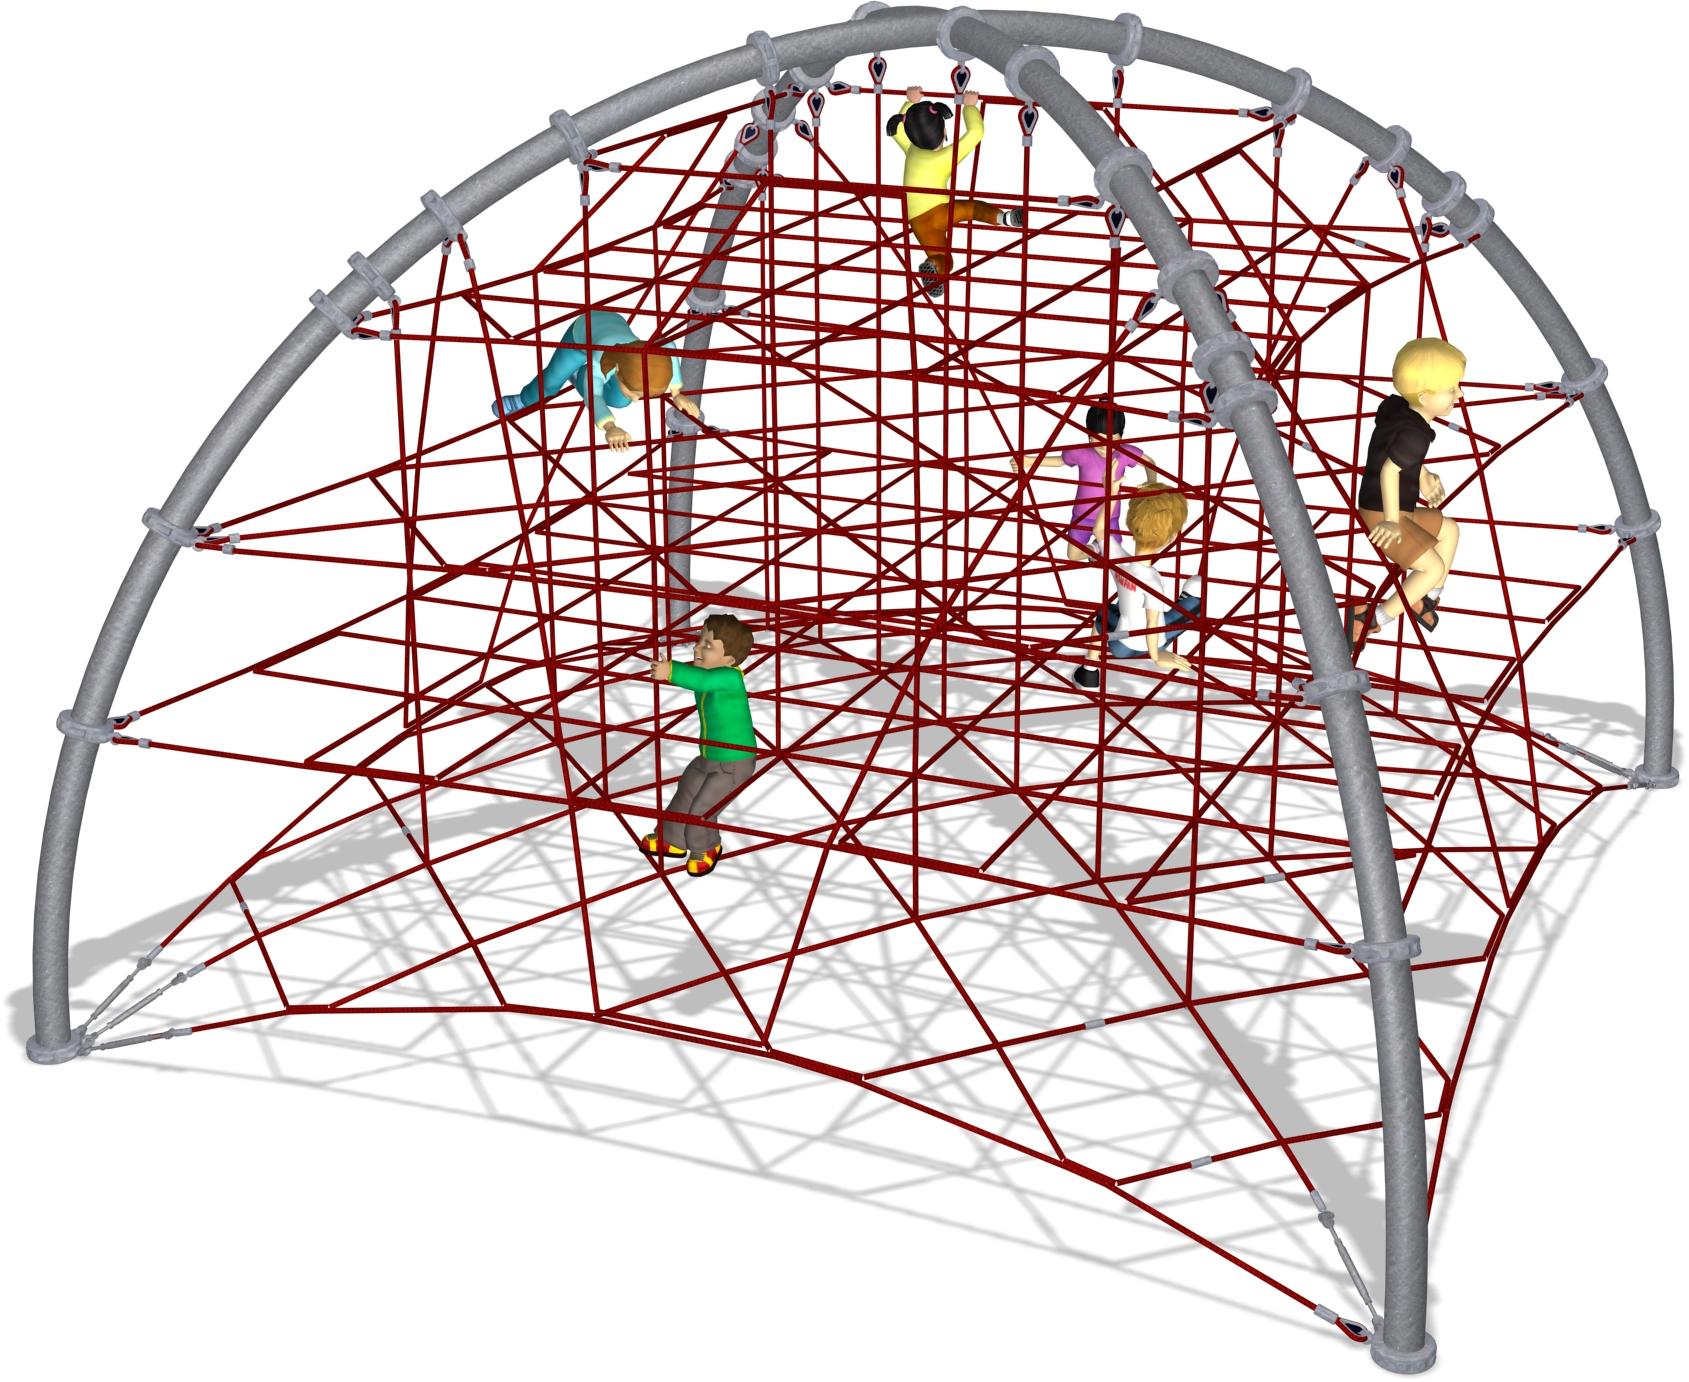 KOMPAN Classic Dome